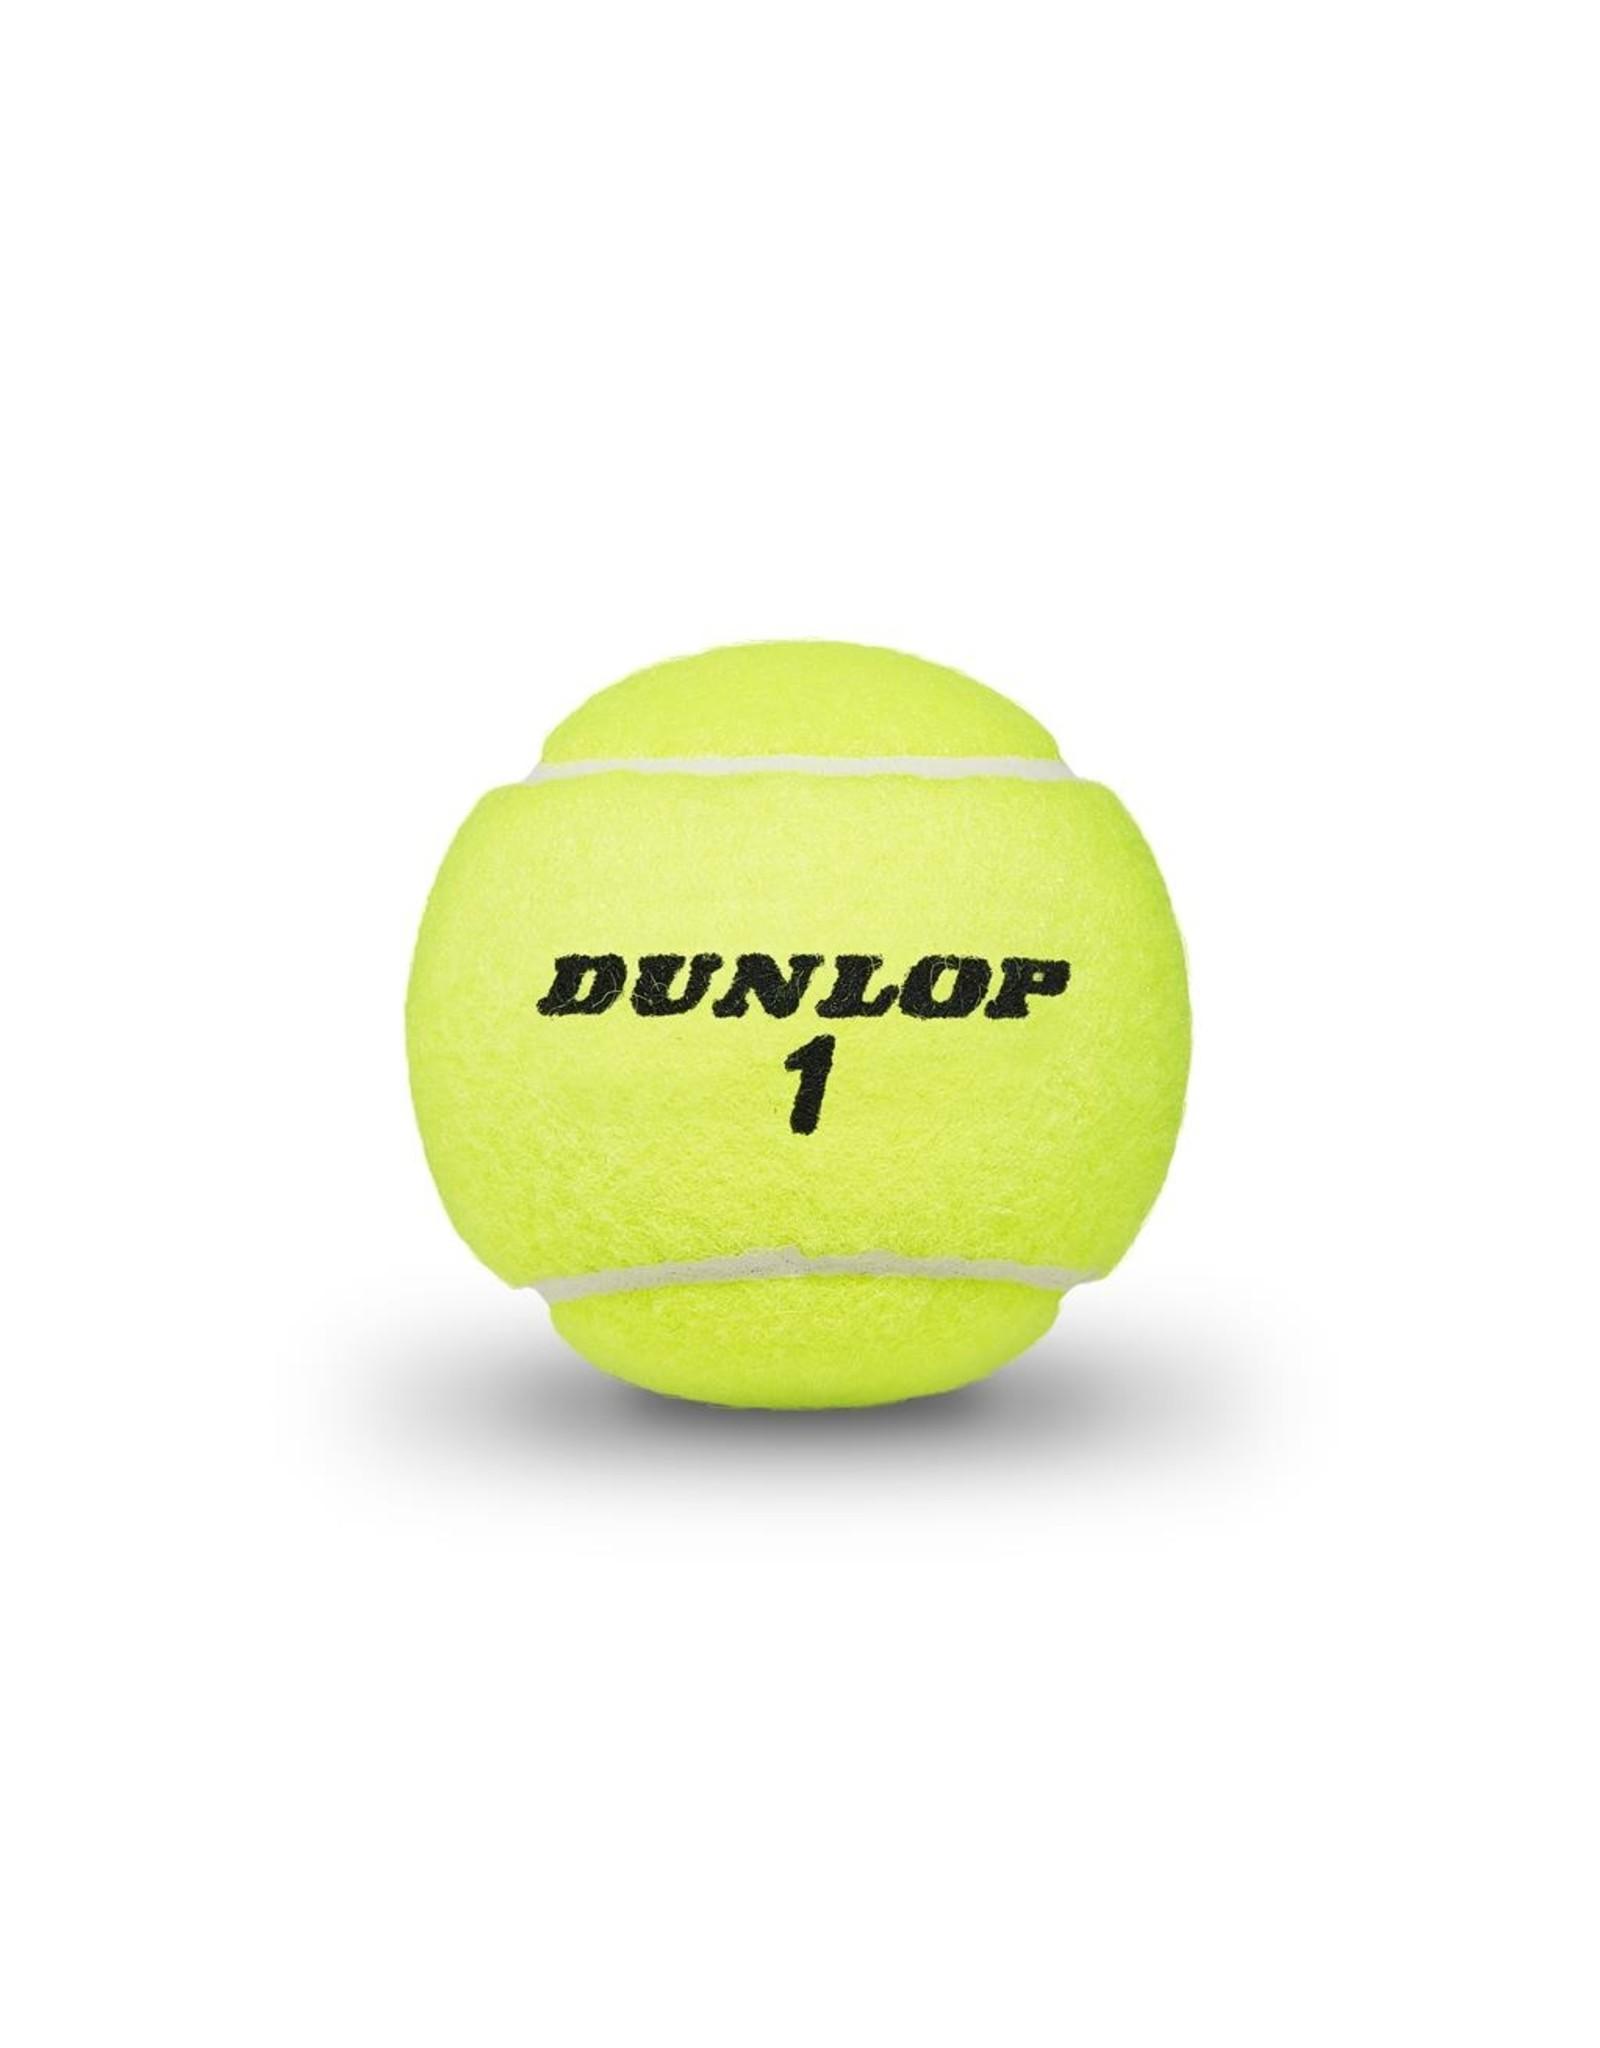 Dunlop D TB EXTRA LIFE P/LESS 3BOX